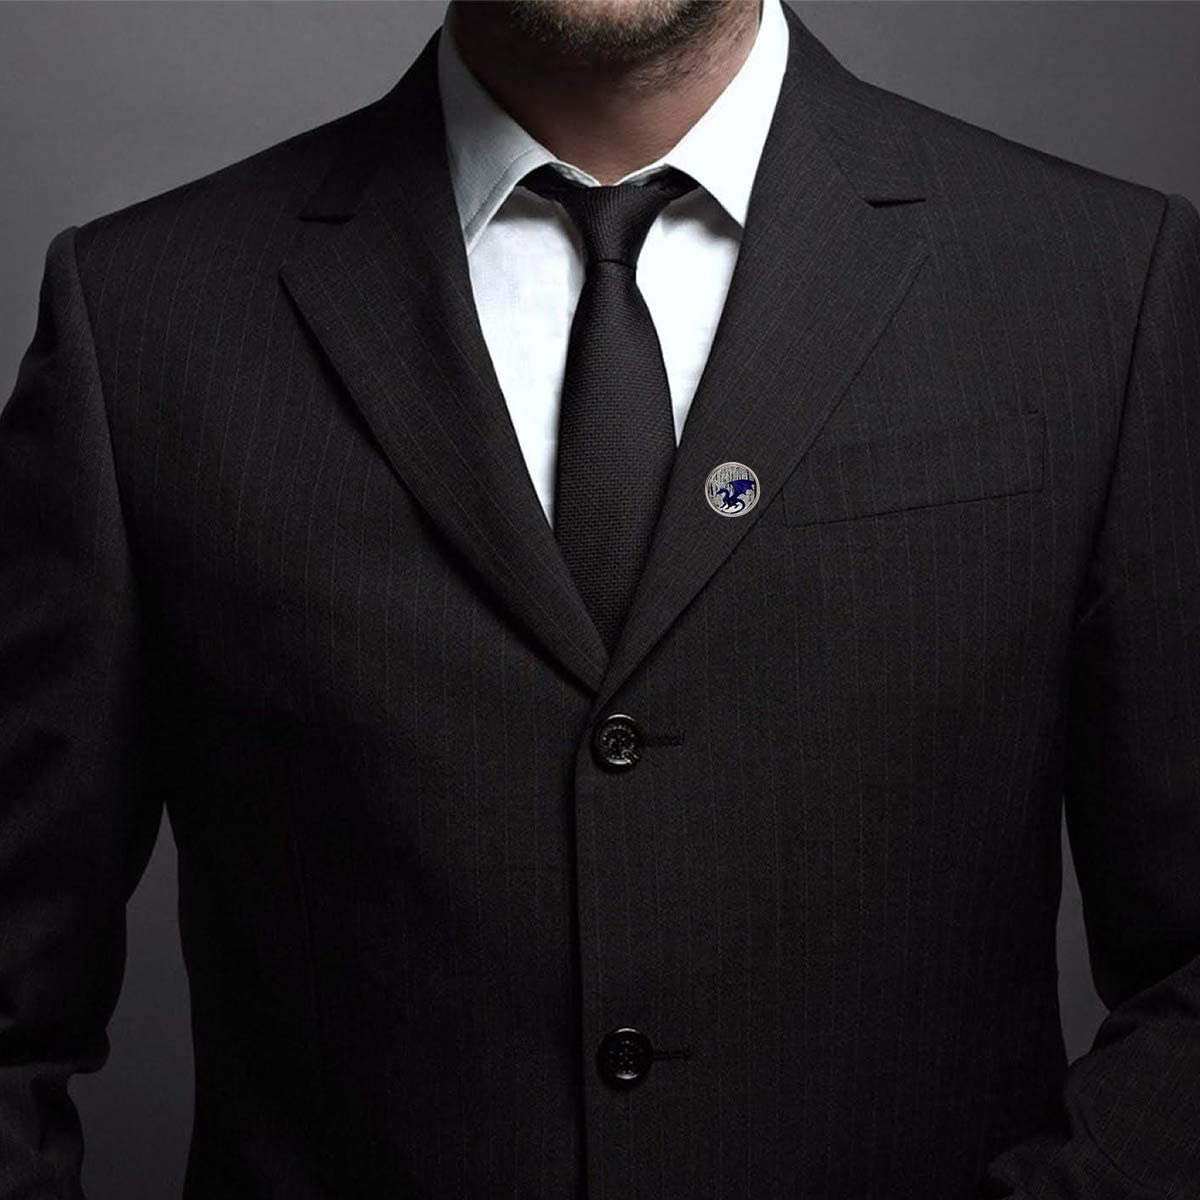 WAZZIT Round Metal Tie Tack Hat Lapel Pin Brooches Blue Vintage Dragon Banquet Badge Enamel Pins Trendy Accessory Jacket T-Shirt